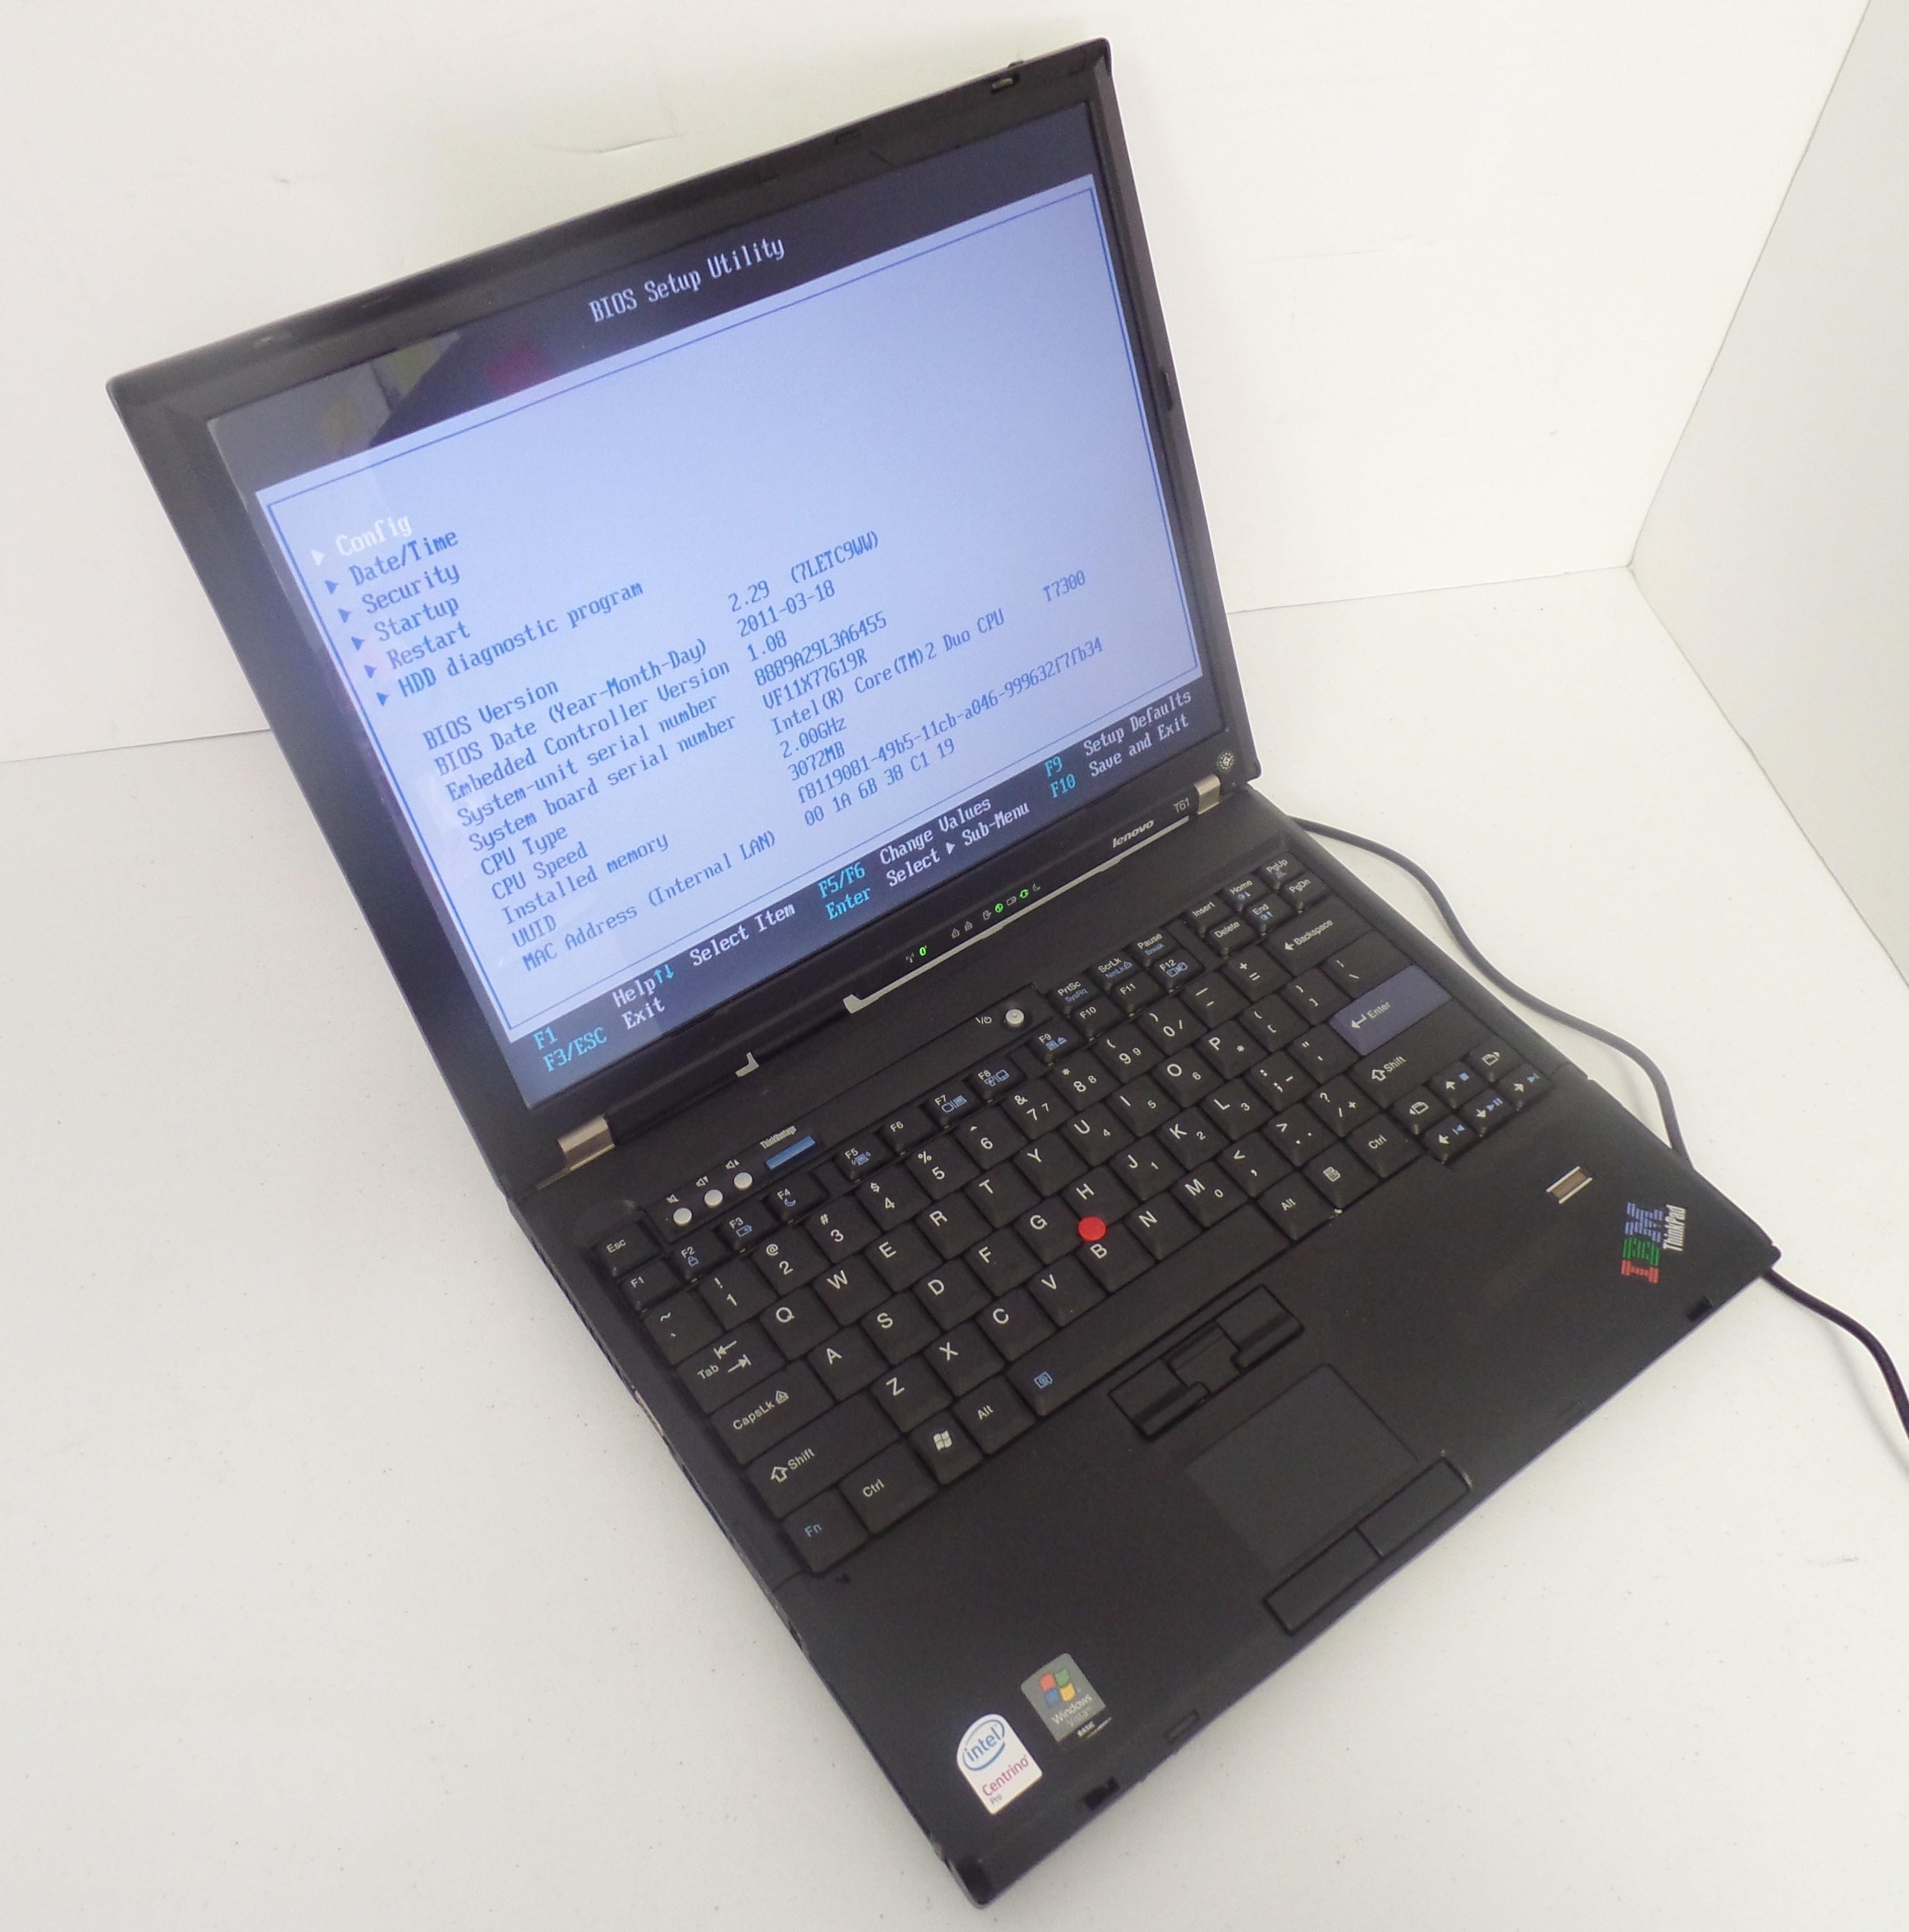 Lenovo T61 Bios